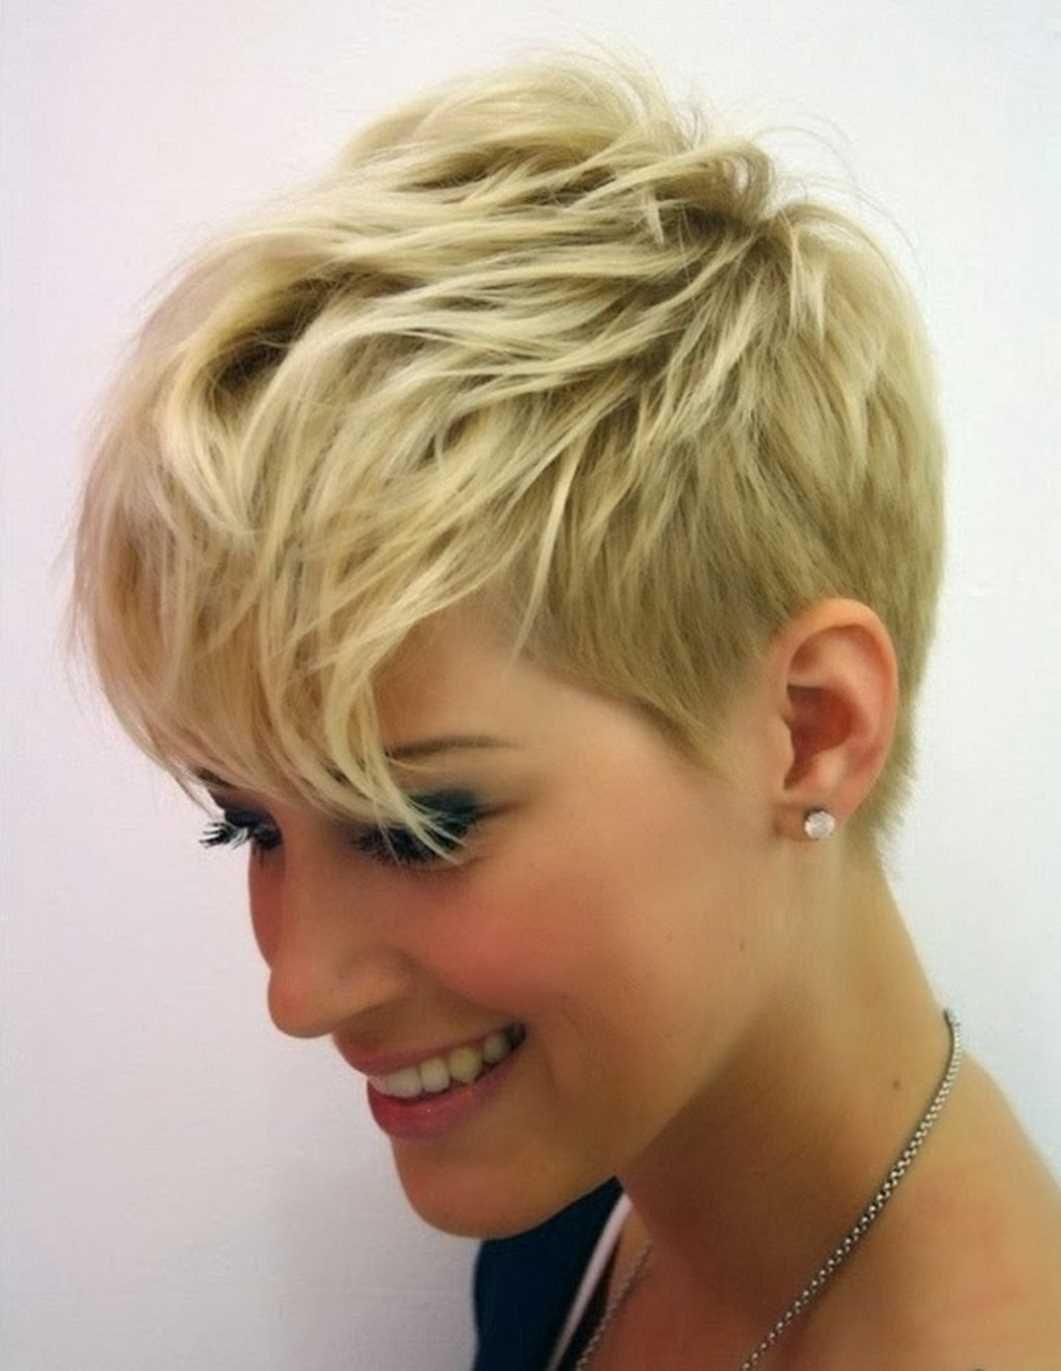 beste short hairstyle 2017   Kurze haare   Pinterest ...